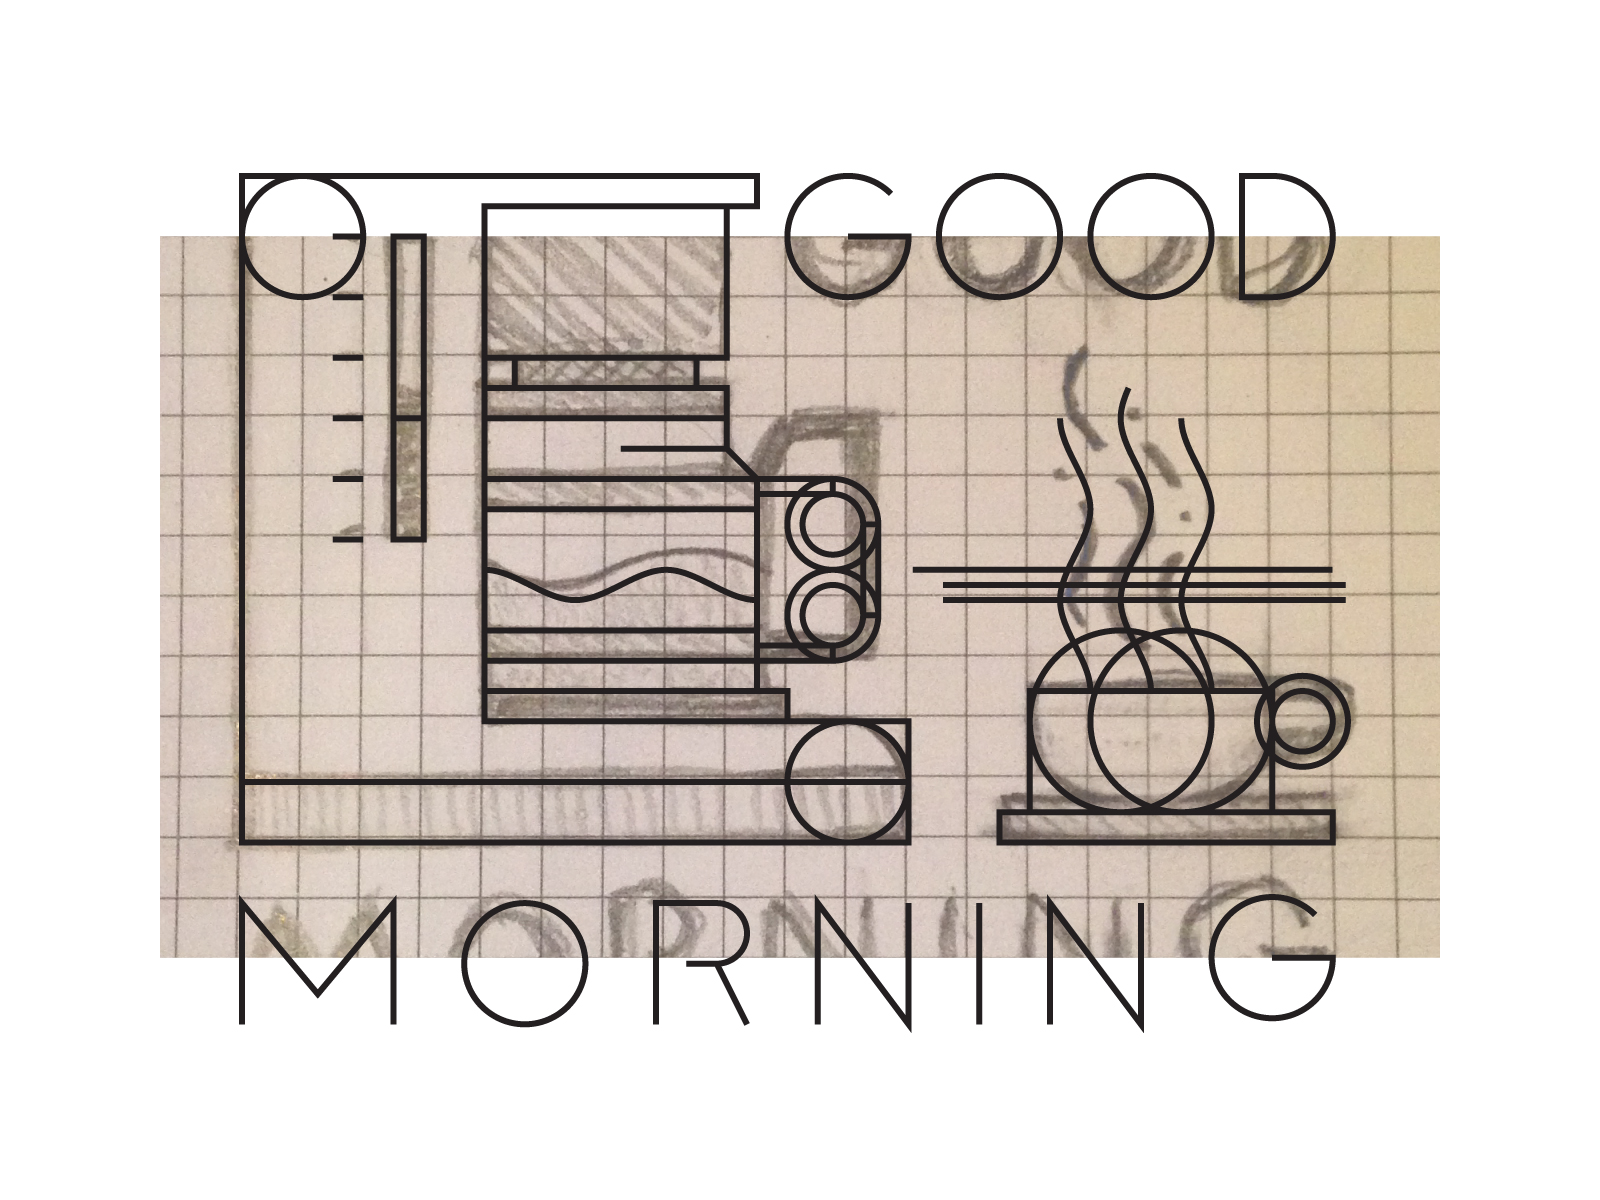 CoffeeMachine_Process_1.0.jpg